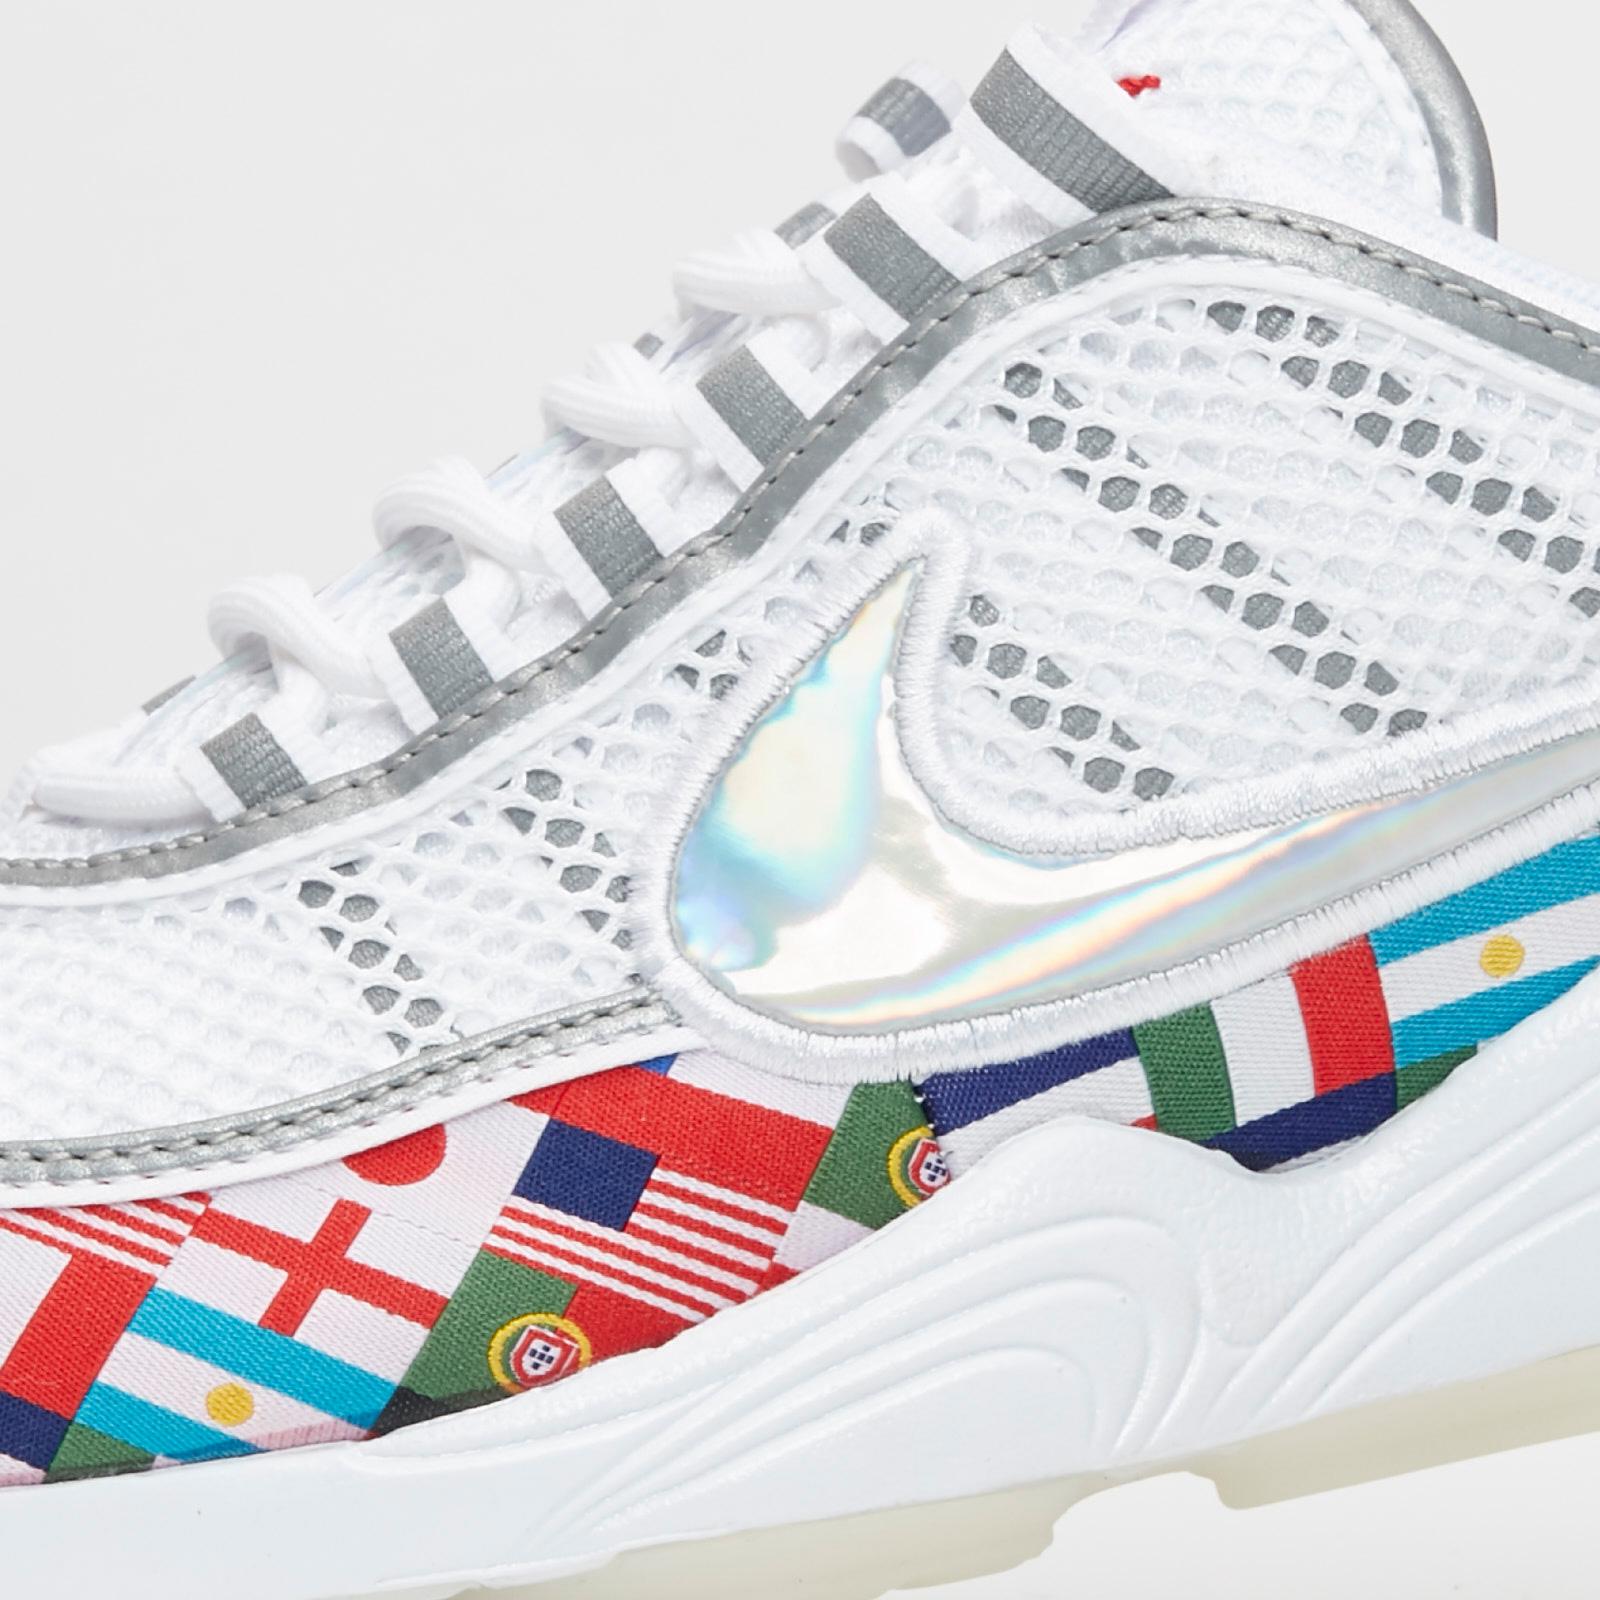 e422708204698 Nike Air Zoom Spiridon 16 NIC QS - Ao5121-100 - Sneakersnstuff ...